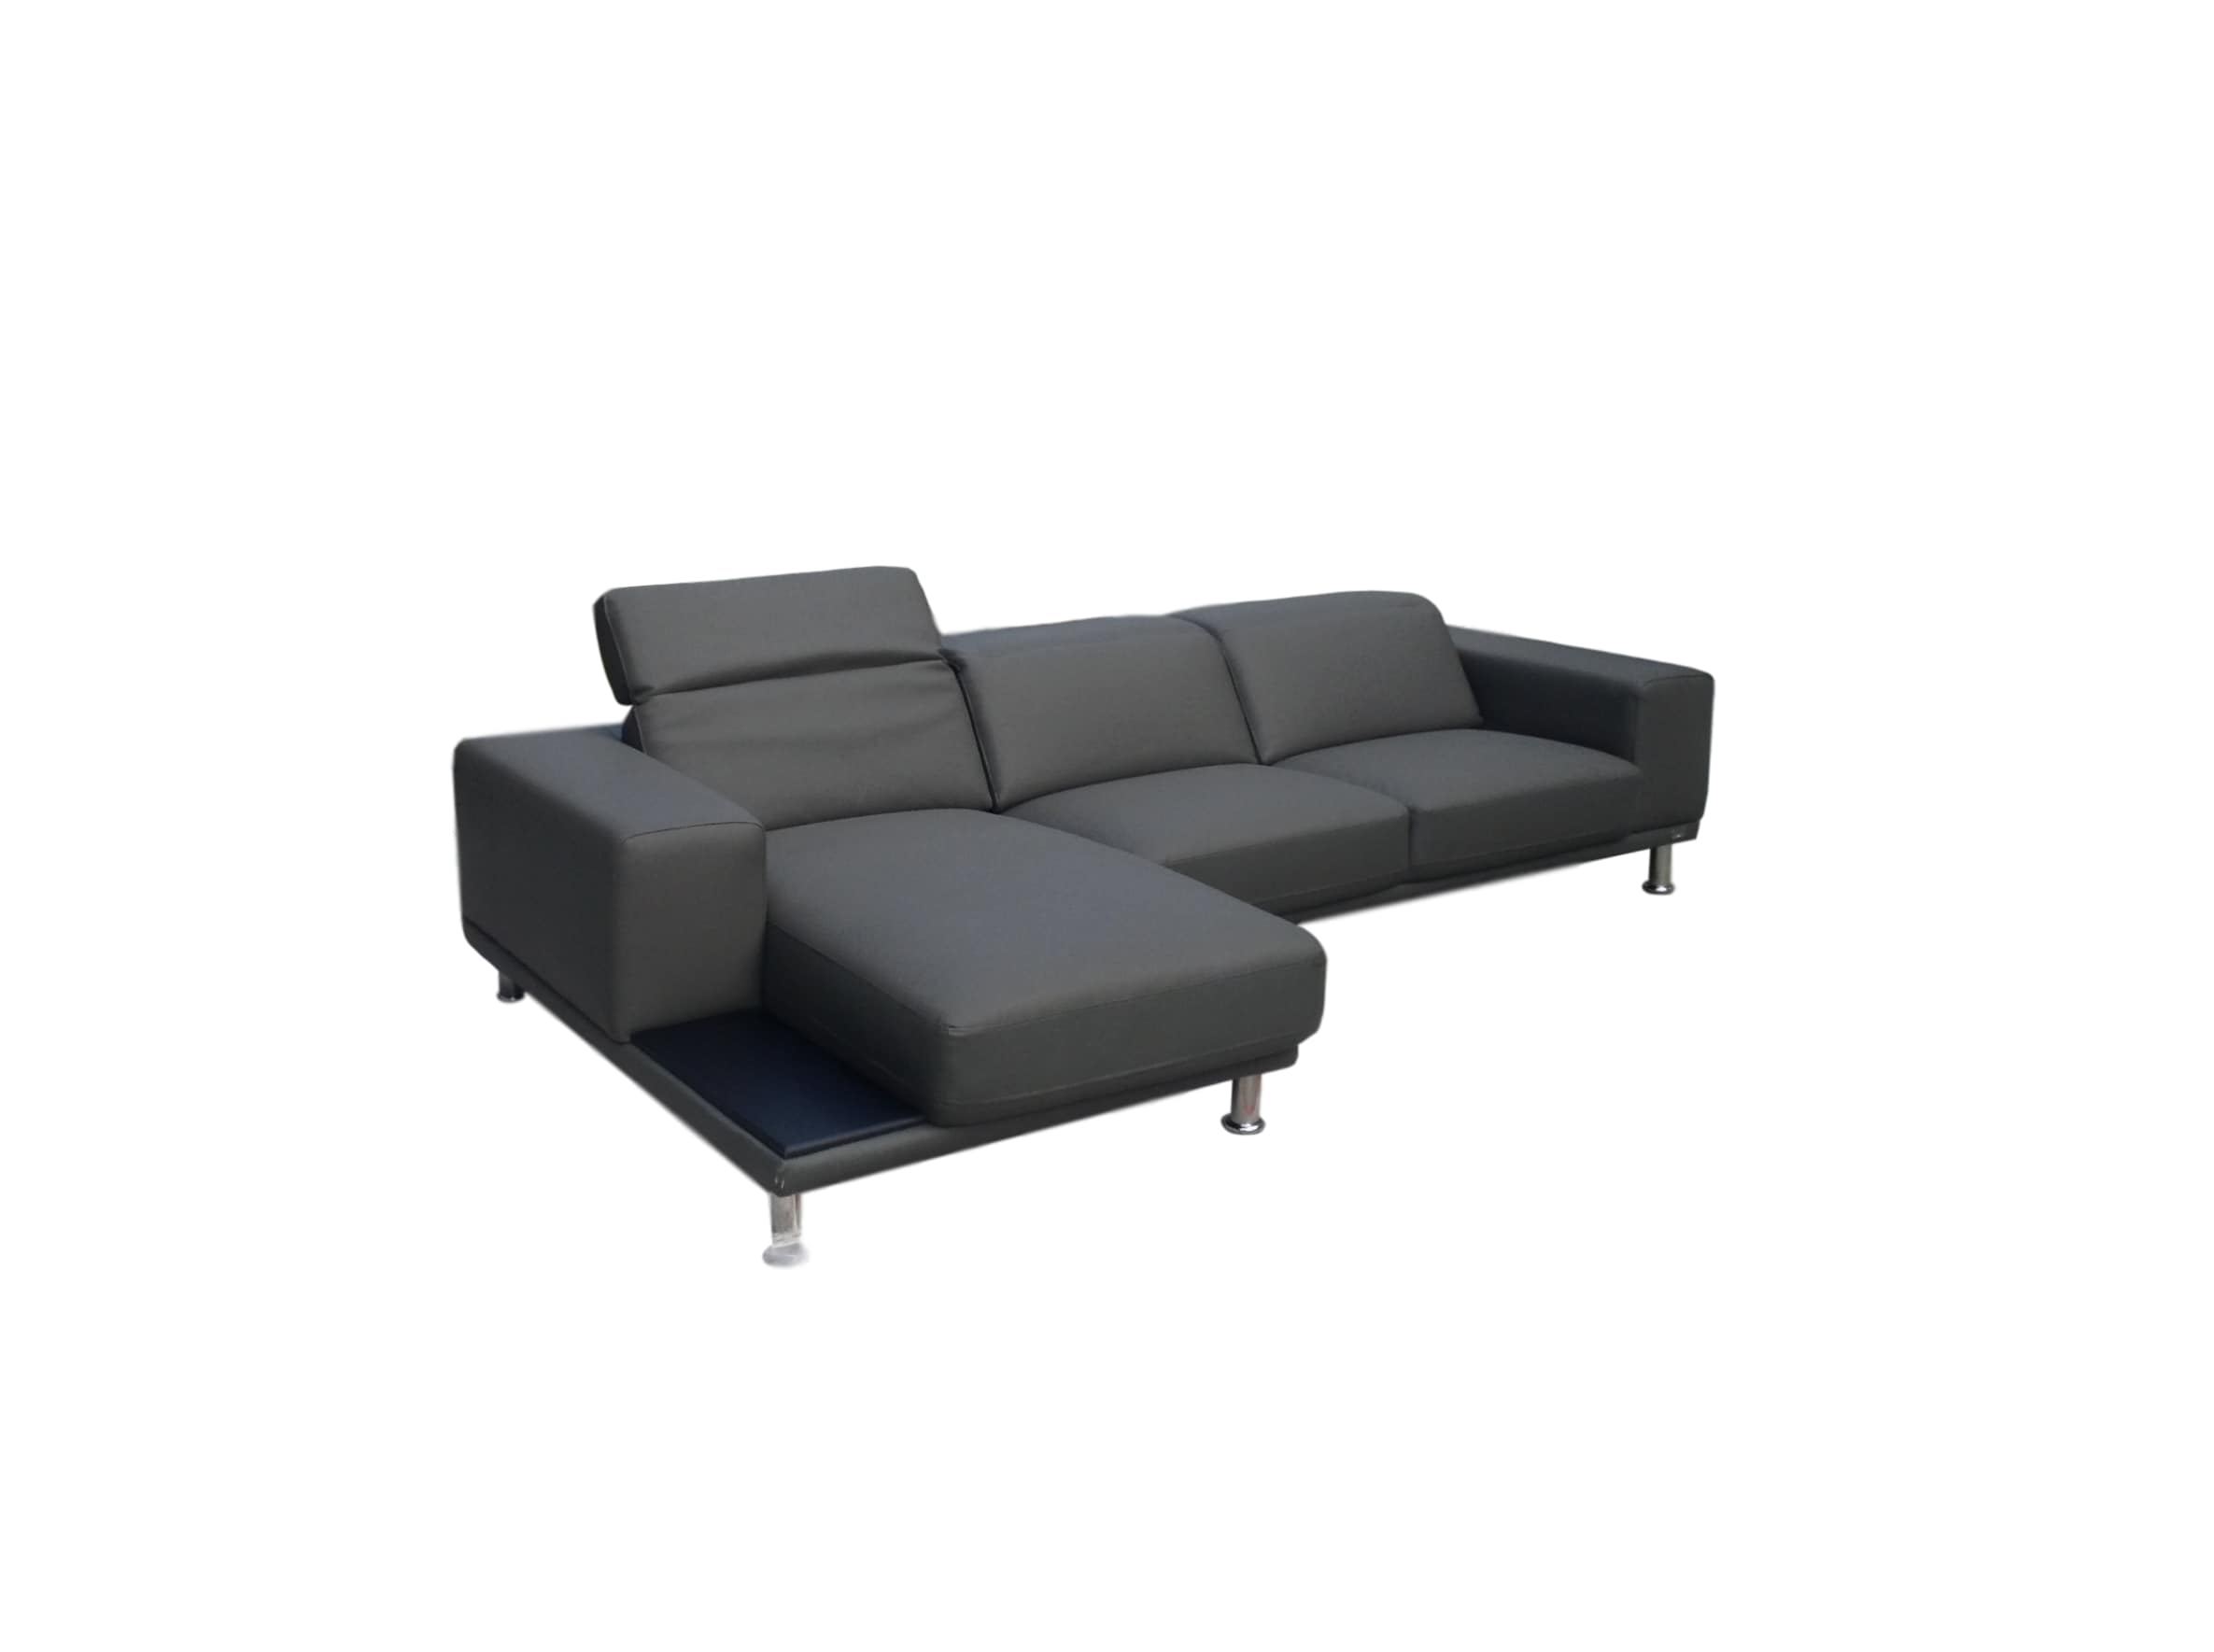 Lawson Grey Leather Sectional   Alabama Furniture